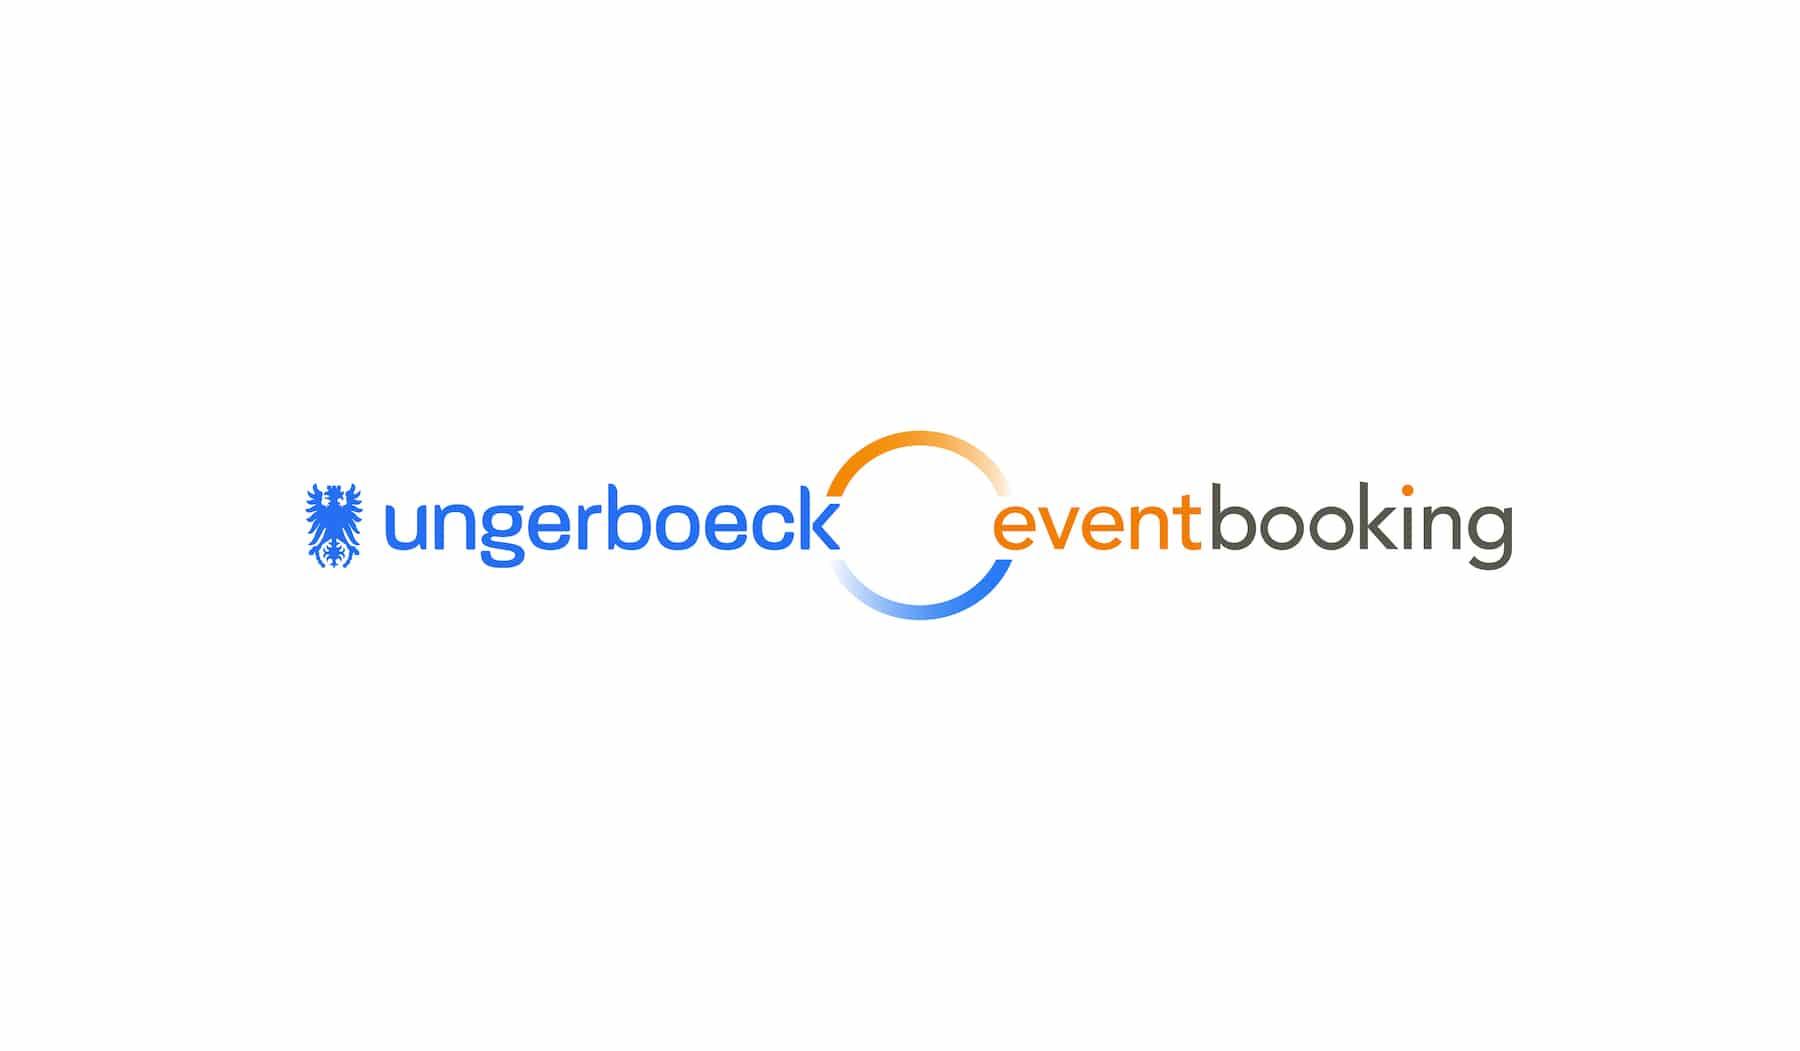 https://aipc.org/wp-content/uploads/2020/09/ungerboeck-eventbooking-NEW-logo.jpg